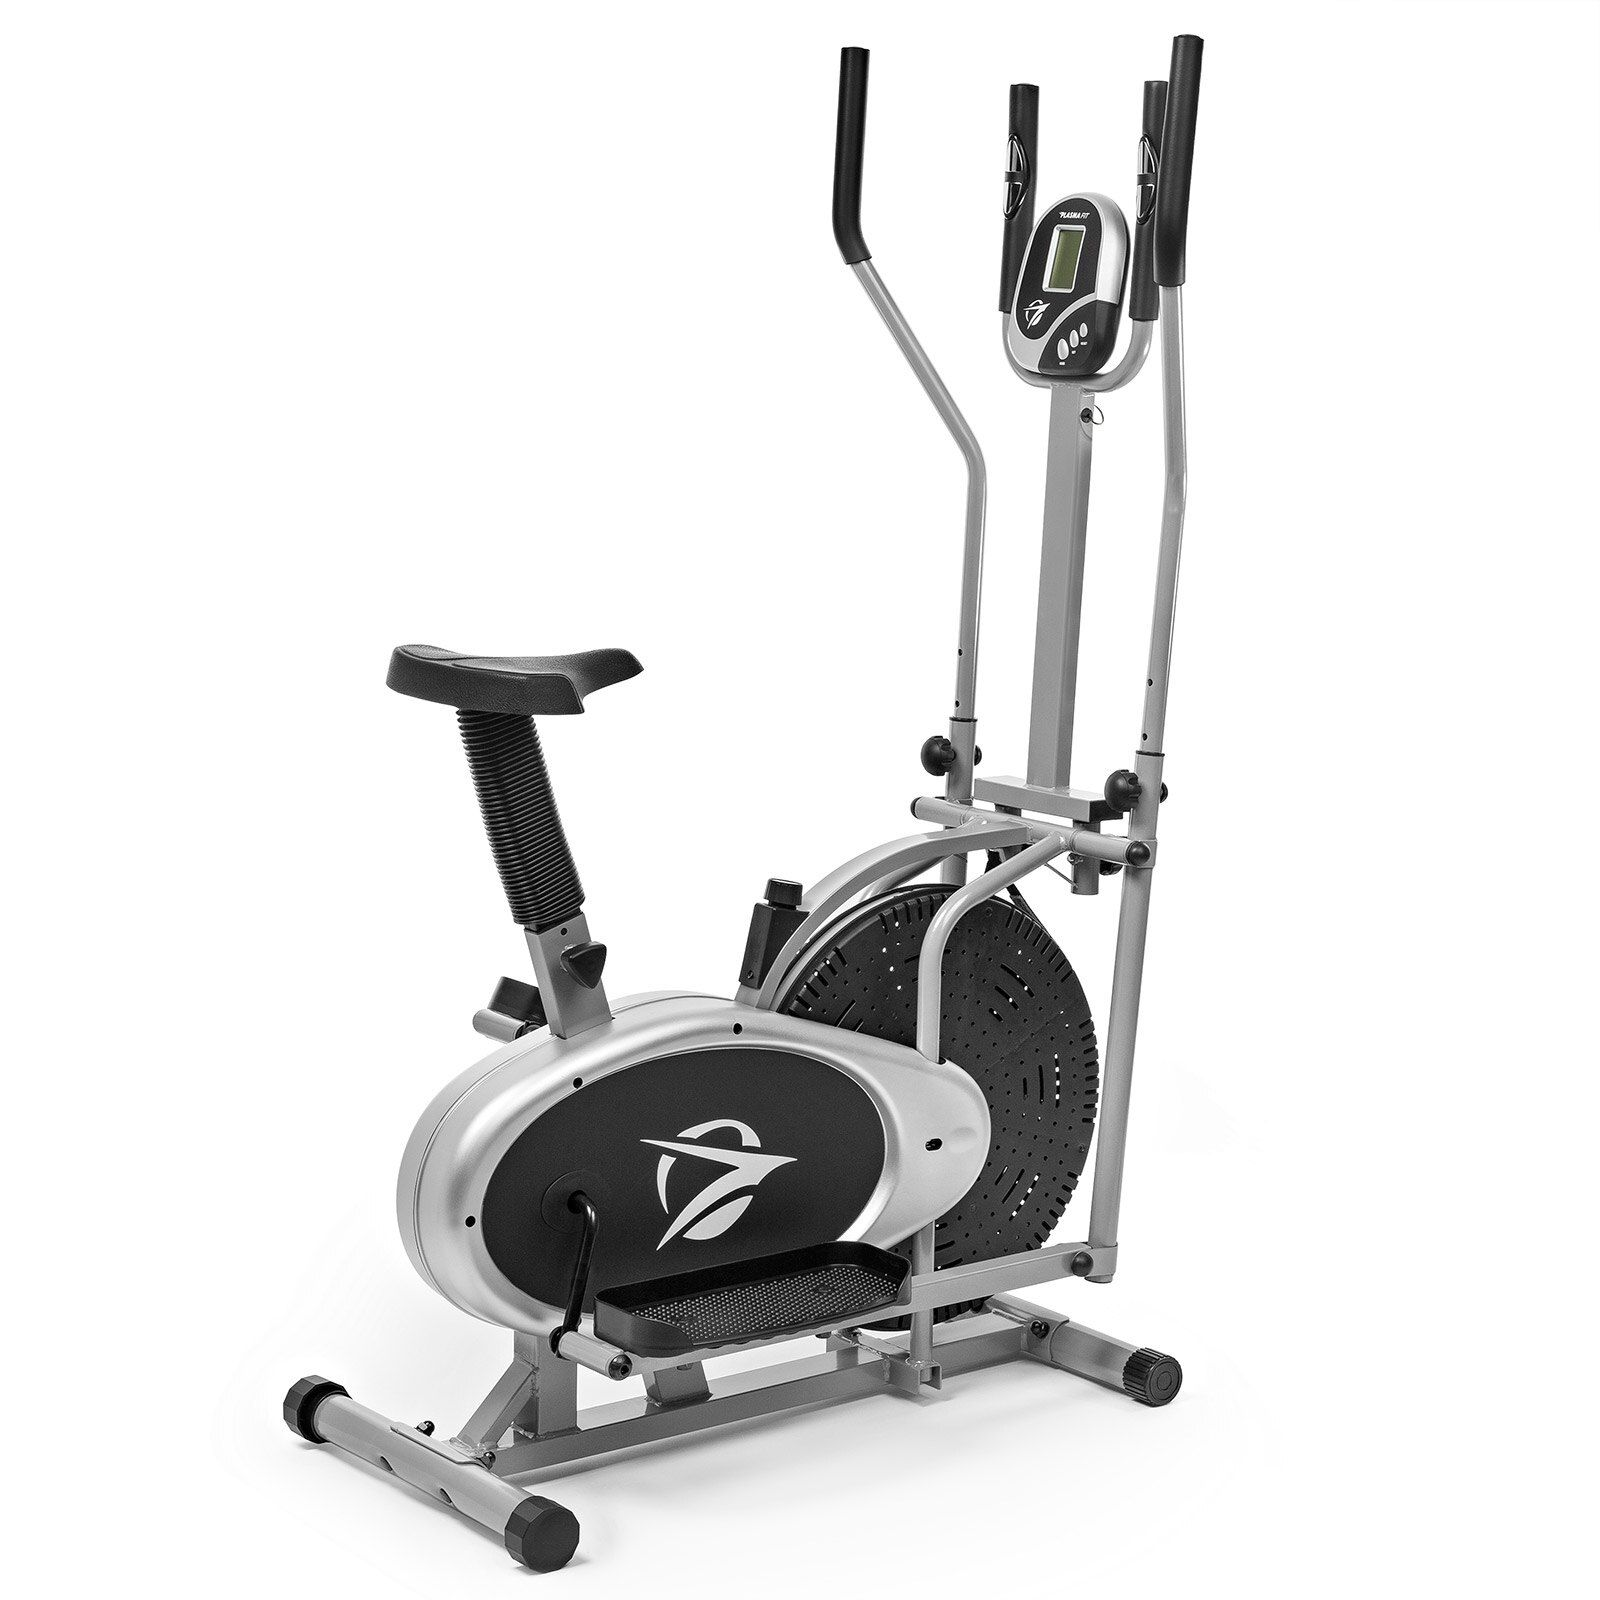 Plasma Cardio Fitness Elliptical Machine Only 91 92 Edeal Info